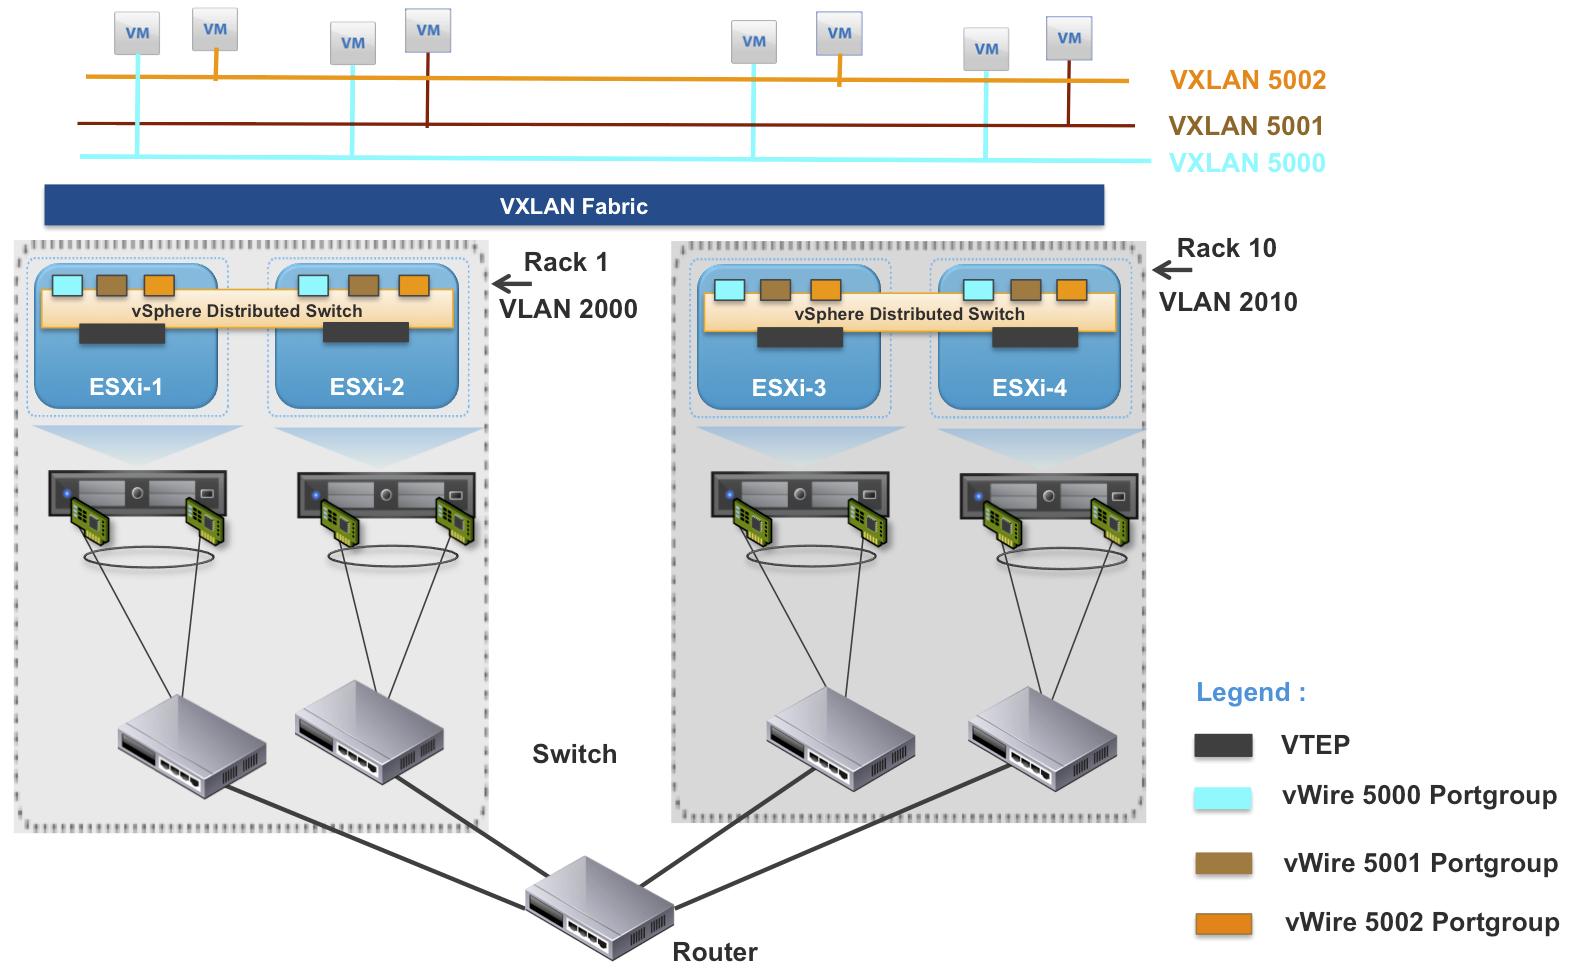 Vmware Rack Diagram Wiring Diagram Ebook